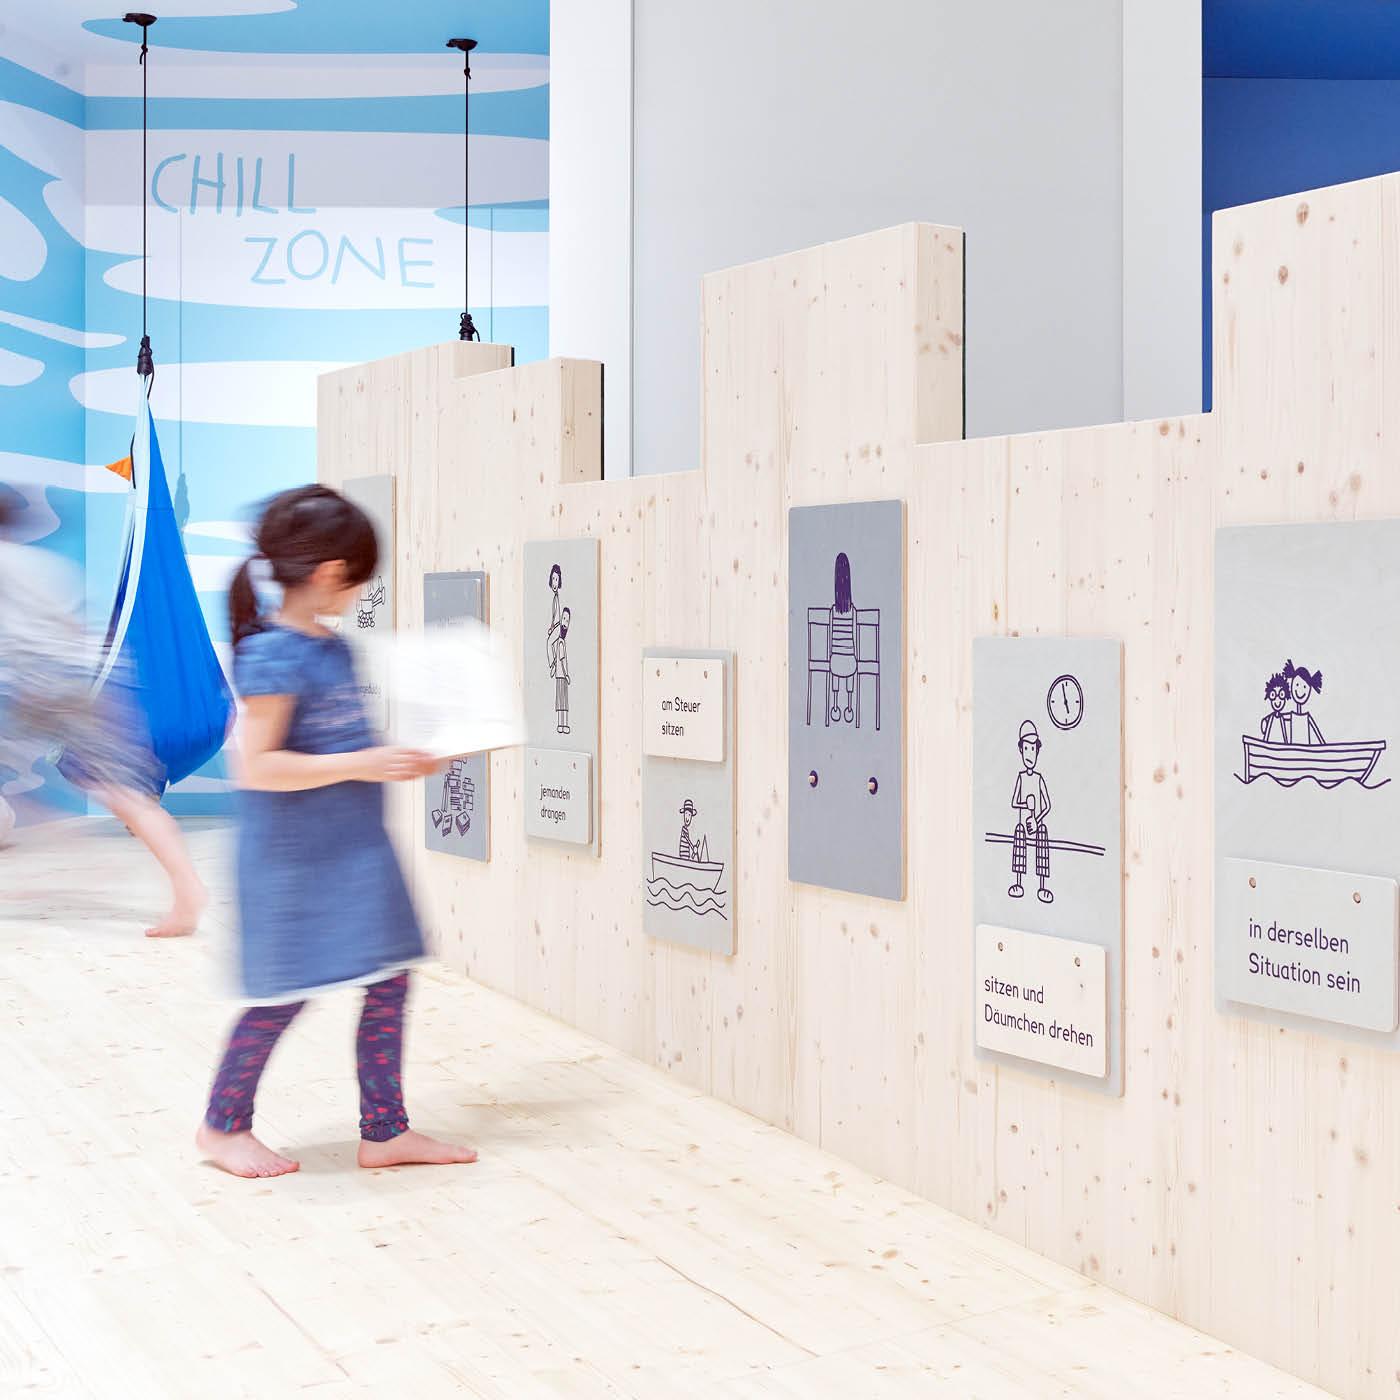 Humboldt Forum Ausstellung Nimm Platz Berlin mit Kind // HIMBEER